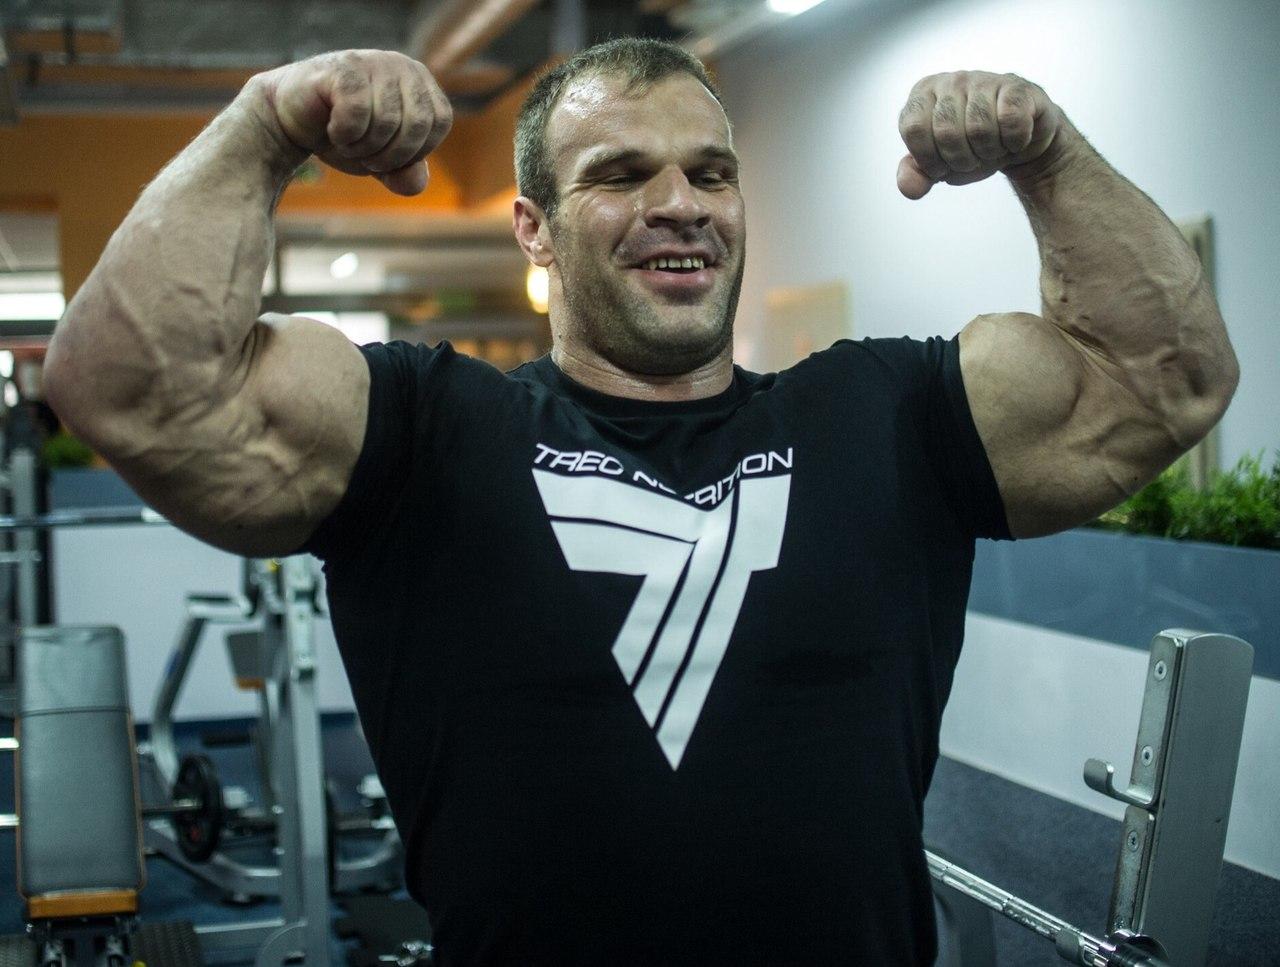 Denis Cyplenkov - double biceps flex │ Photo Source: Trec Nutrition